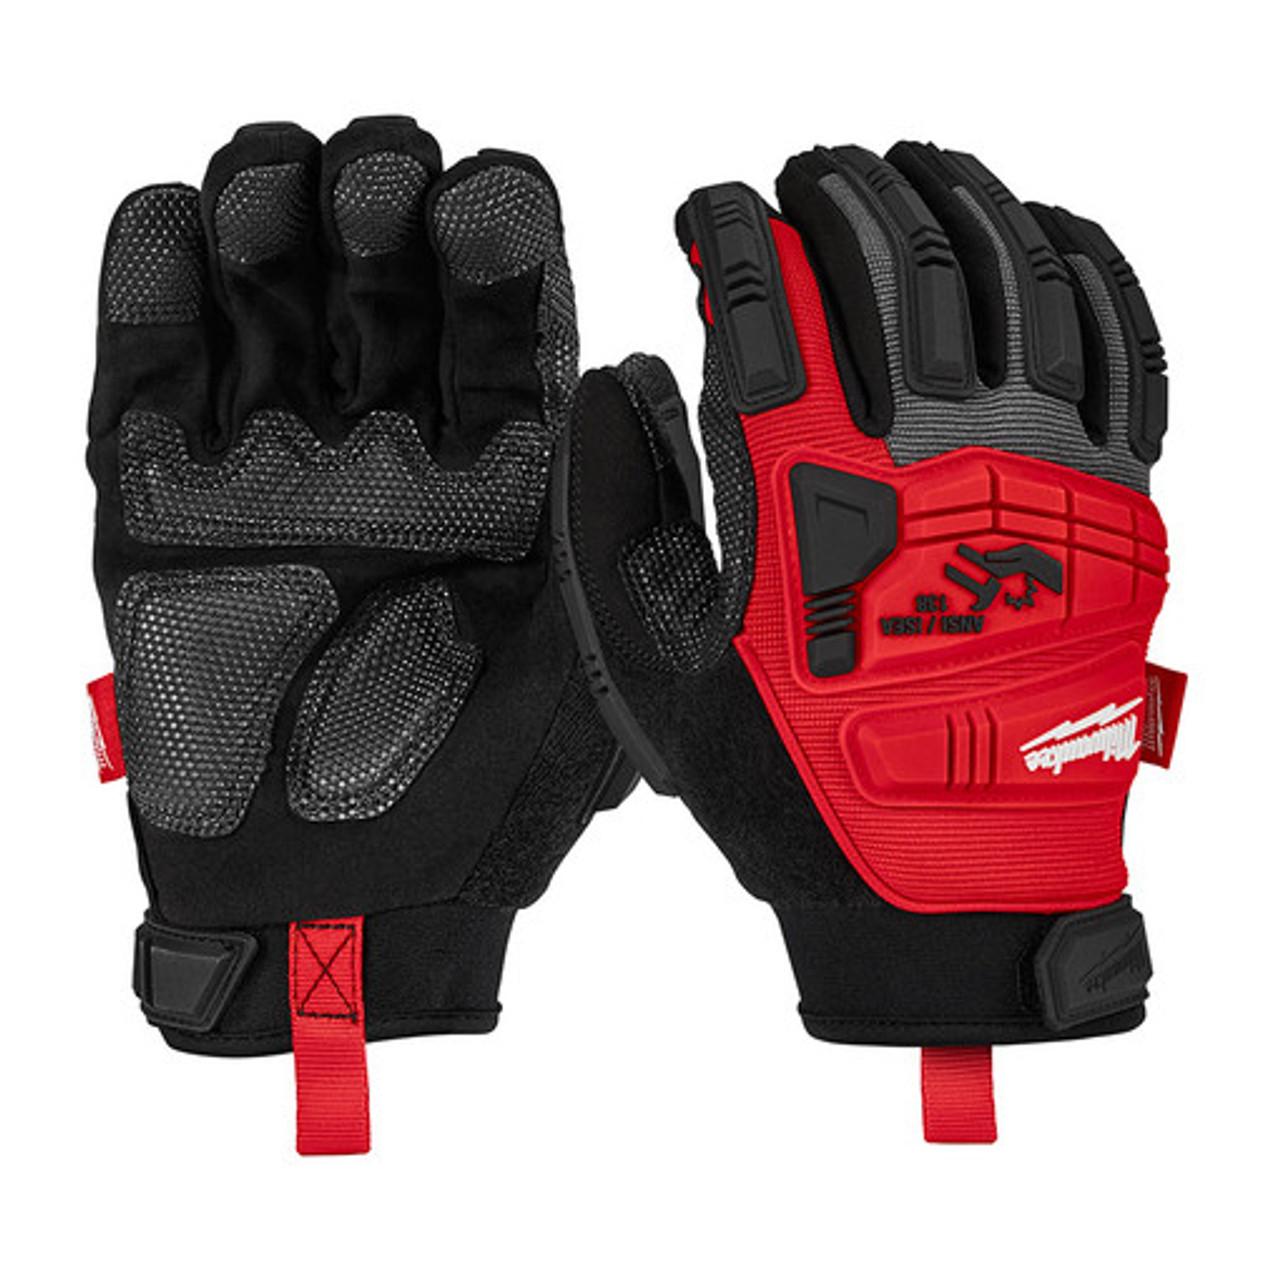 Milwaukee 48-22-8751 Impact Demolition Gloves Medium